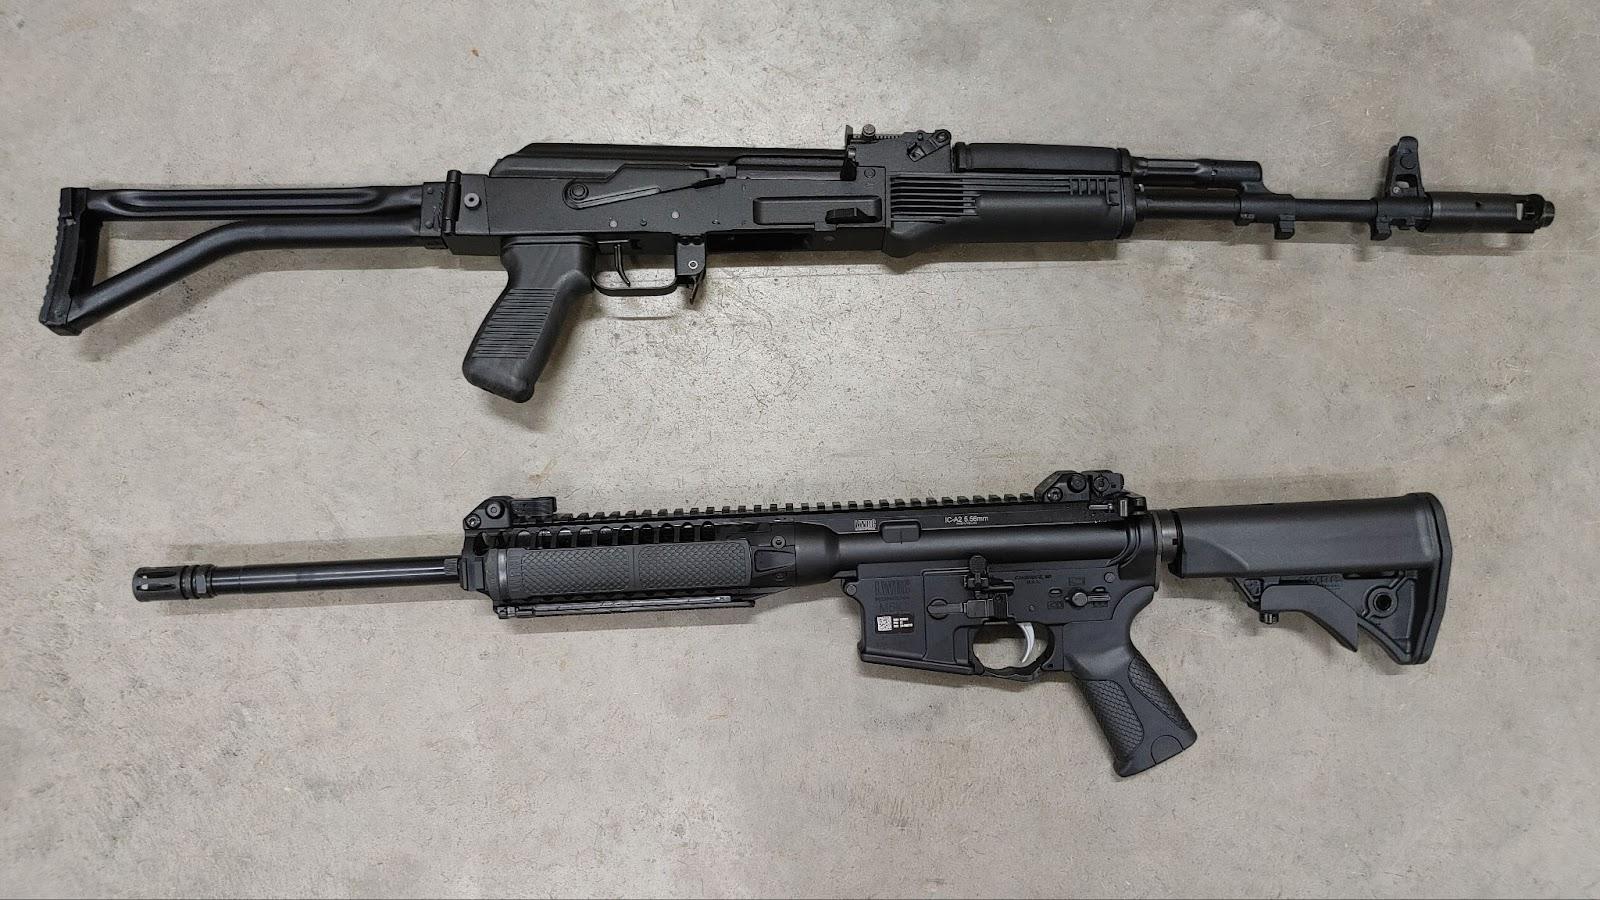 Arsenal AK-47 vs LWRC AR-15